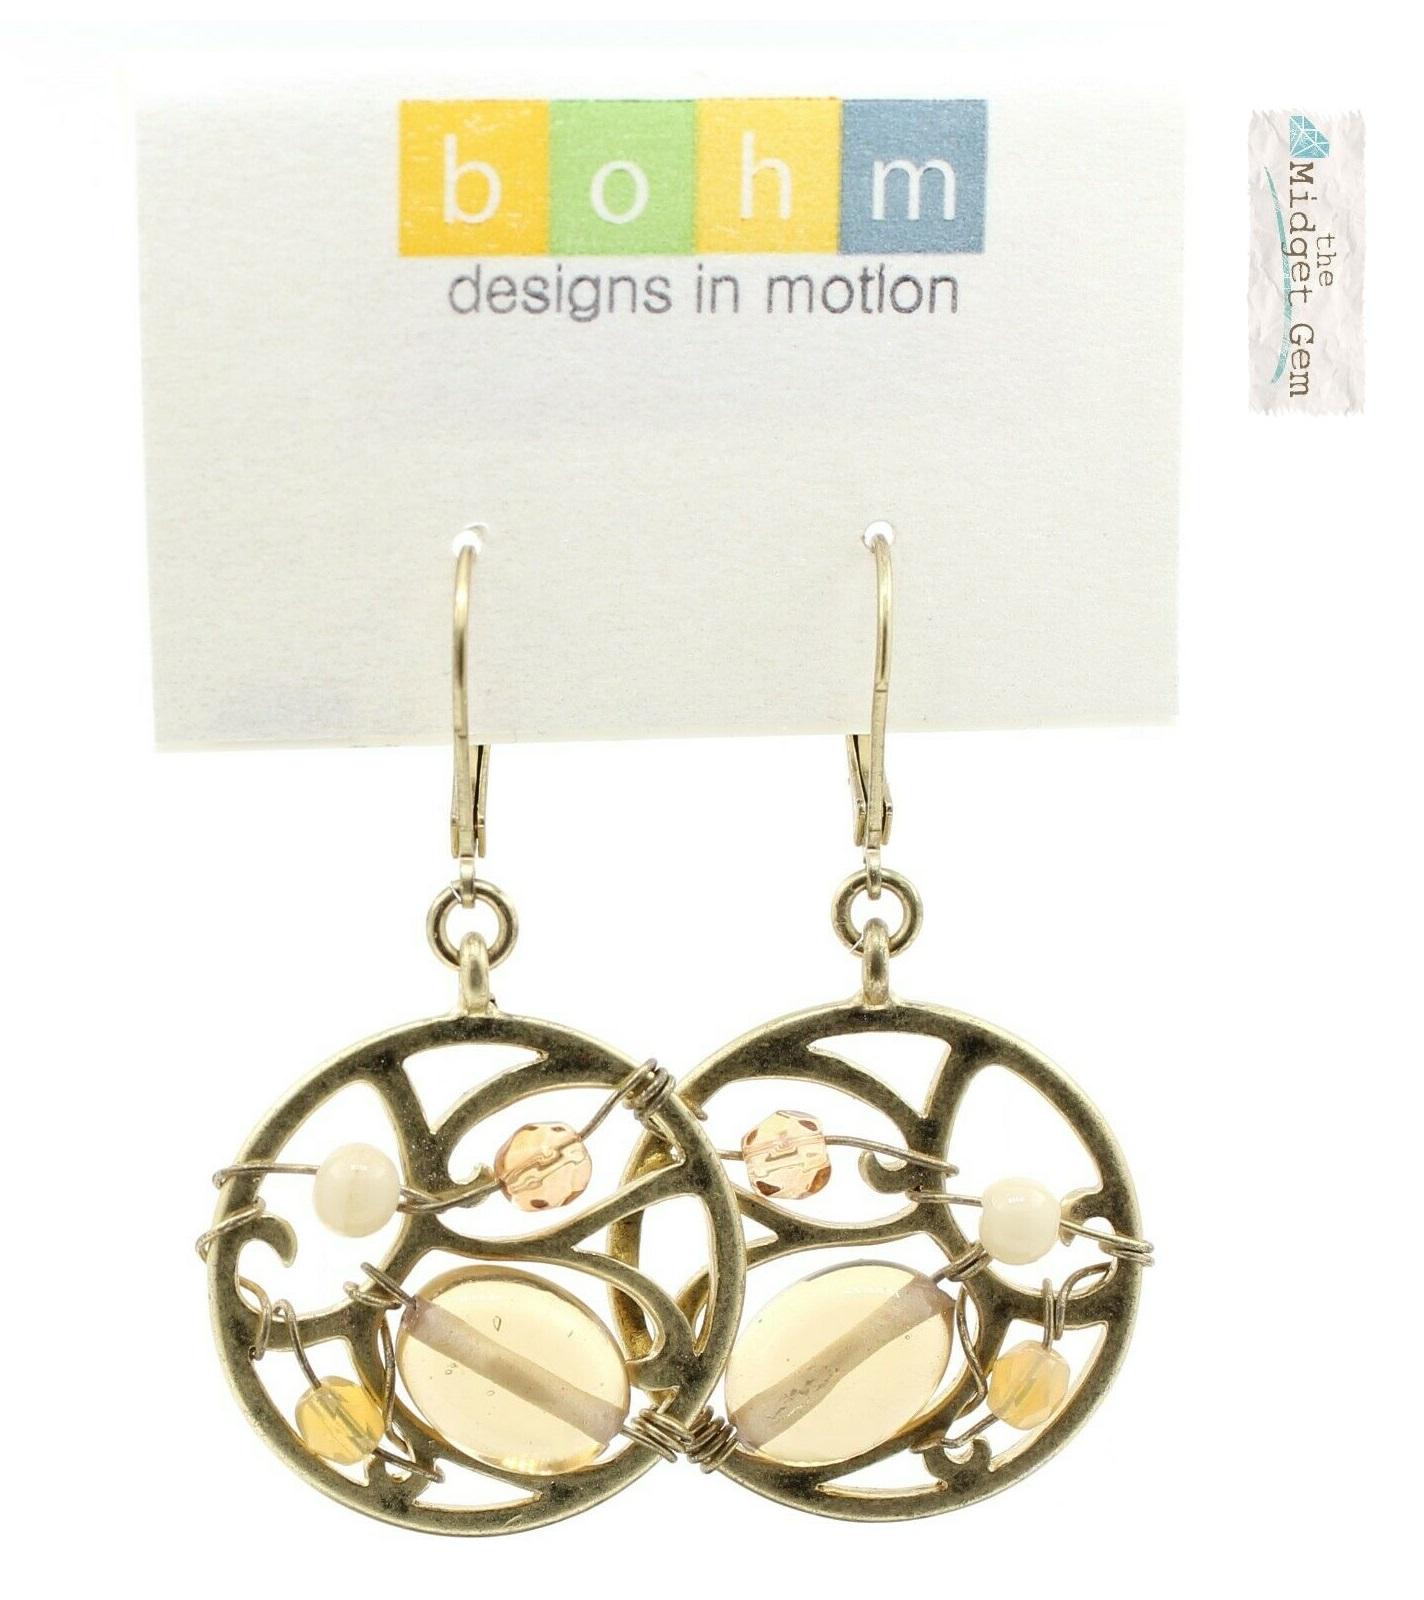 Bohm Floral Folklore - Silhouette & Glass Beaded Earrings - Gold Plate/Beige & Cream BNWT